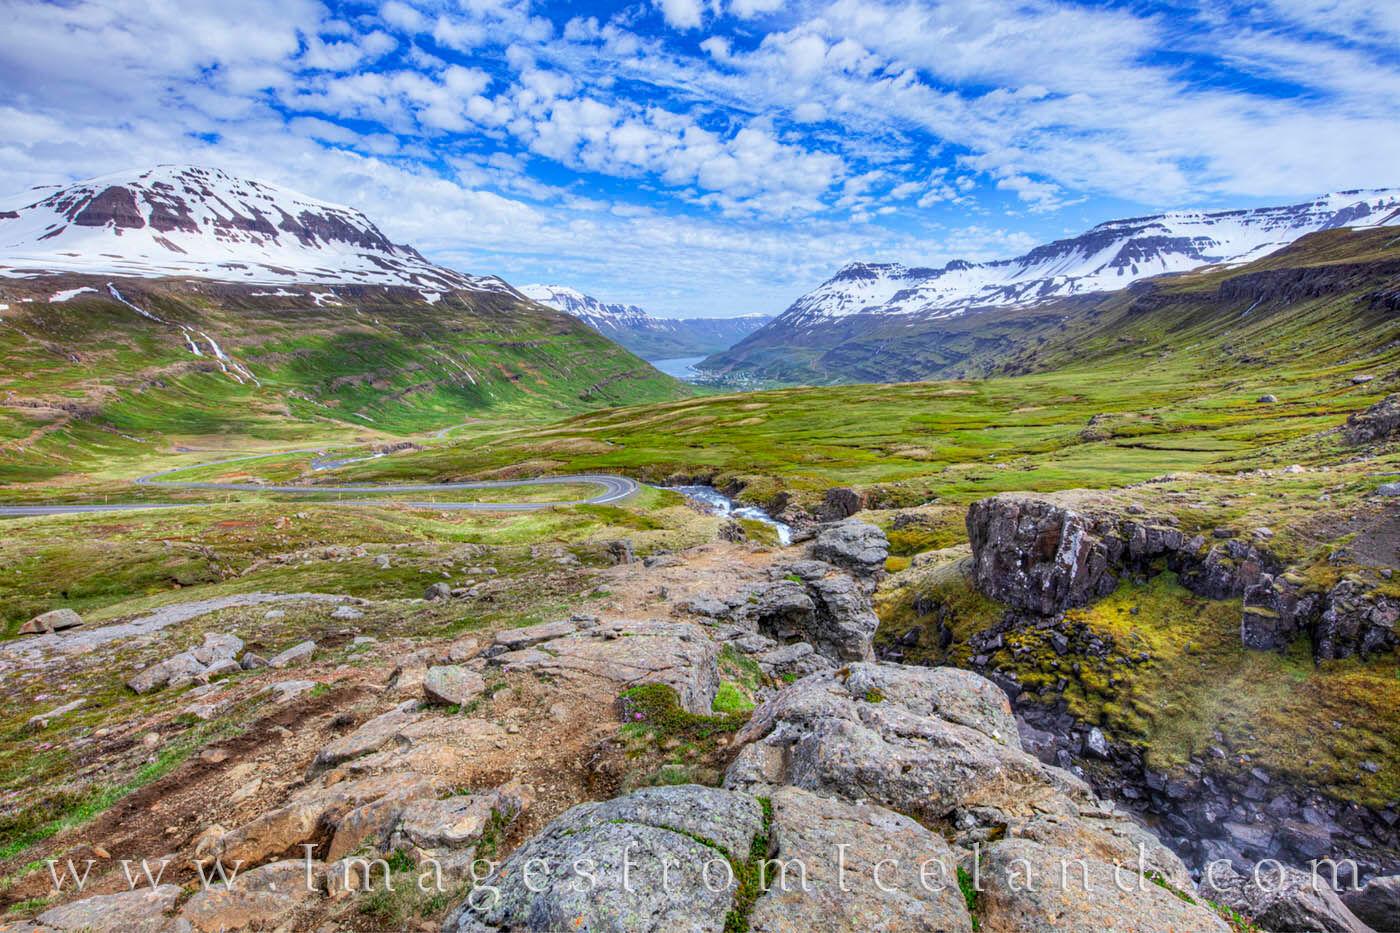 Highway 93, or Vesturvegur, winds down the glacial valley into the village of Seydisfjördur. It follows the River Fjarðará...